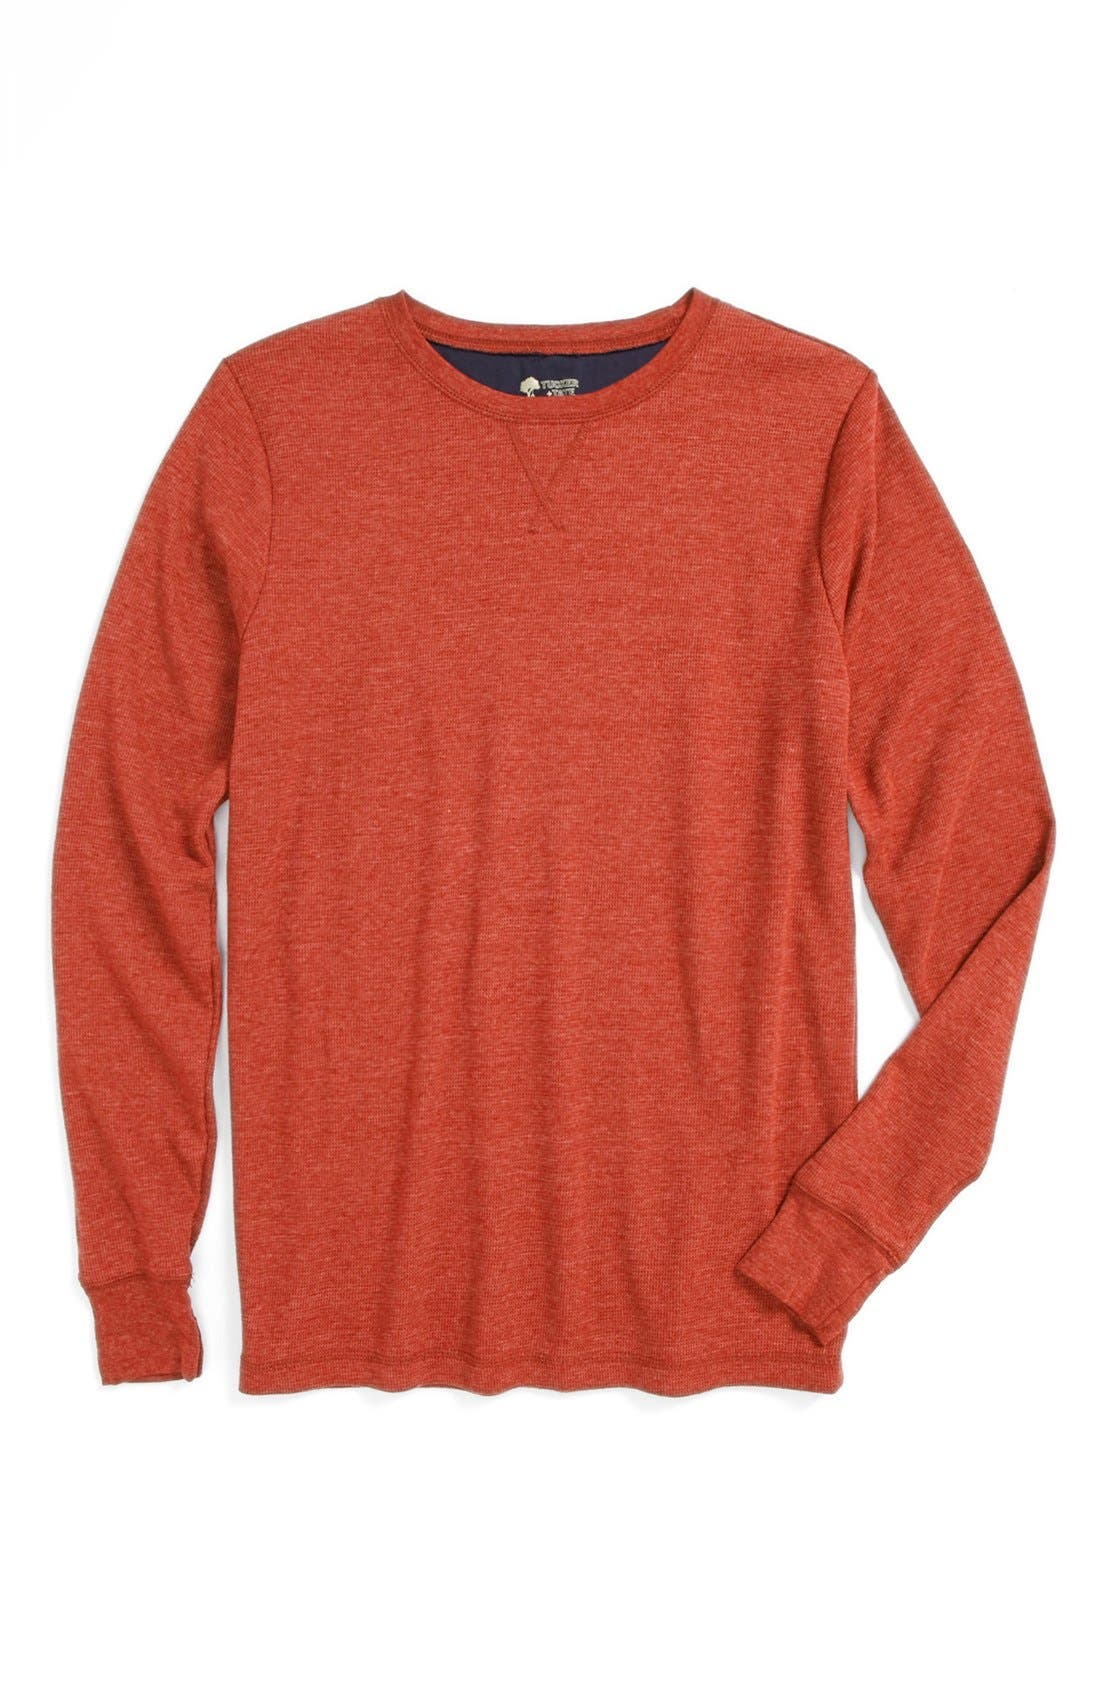 Main Image - Tucker + Tate 'Sultan' Long Sleeve Thermal T-Shirt (Little Boys)